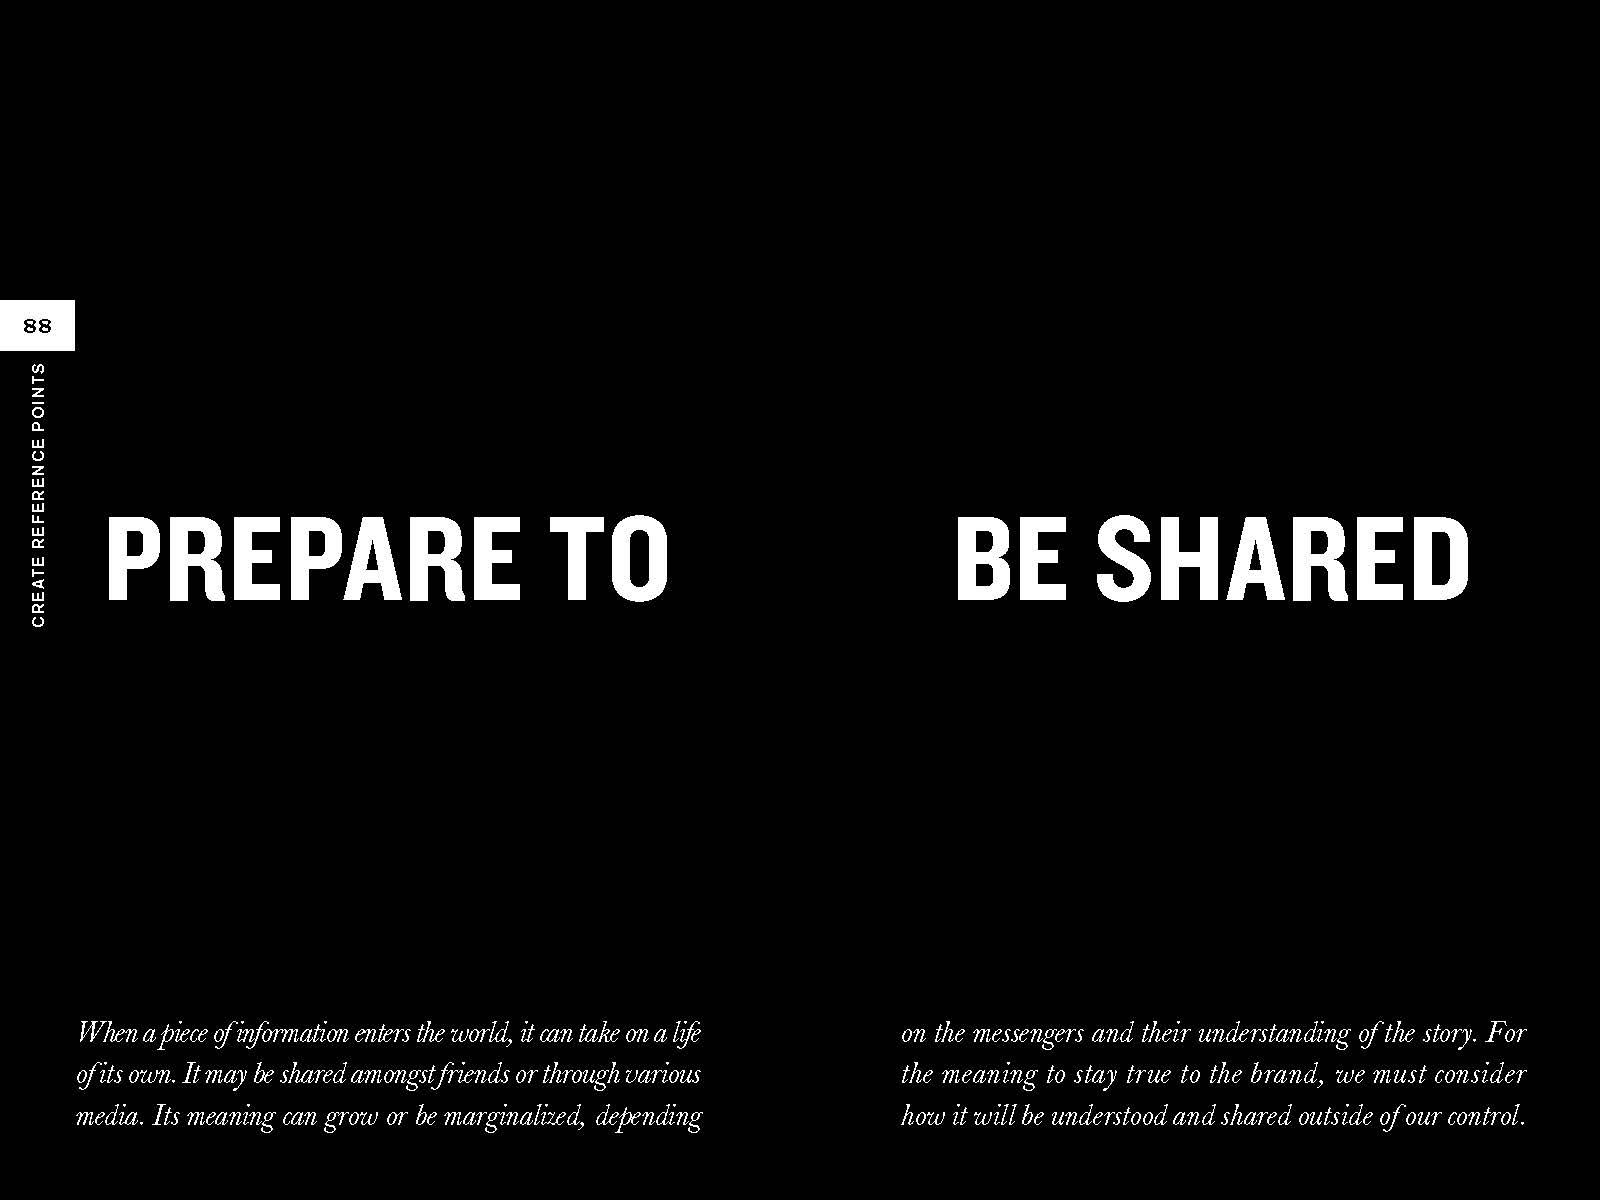 Jack Daniel's Guiding Principles 2012_Page_48.jpg